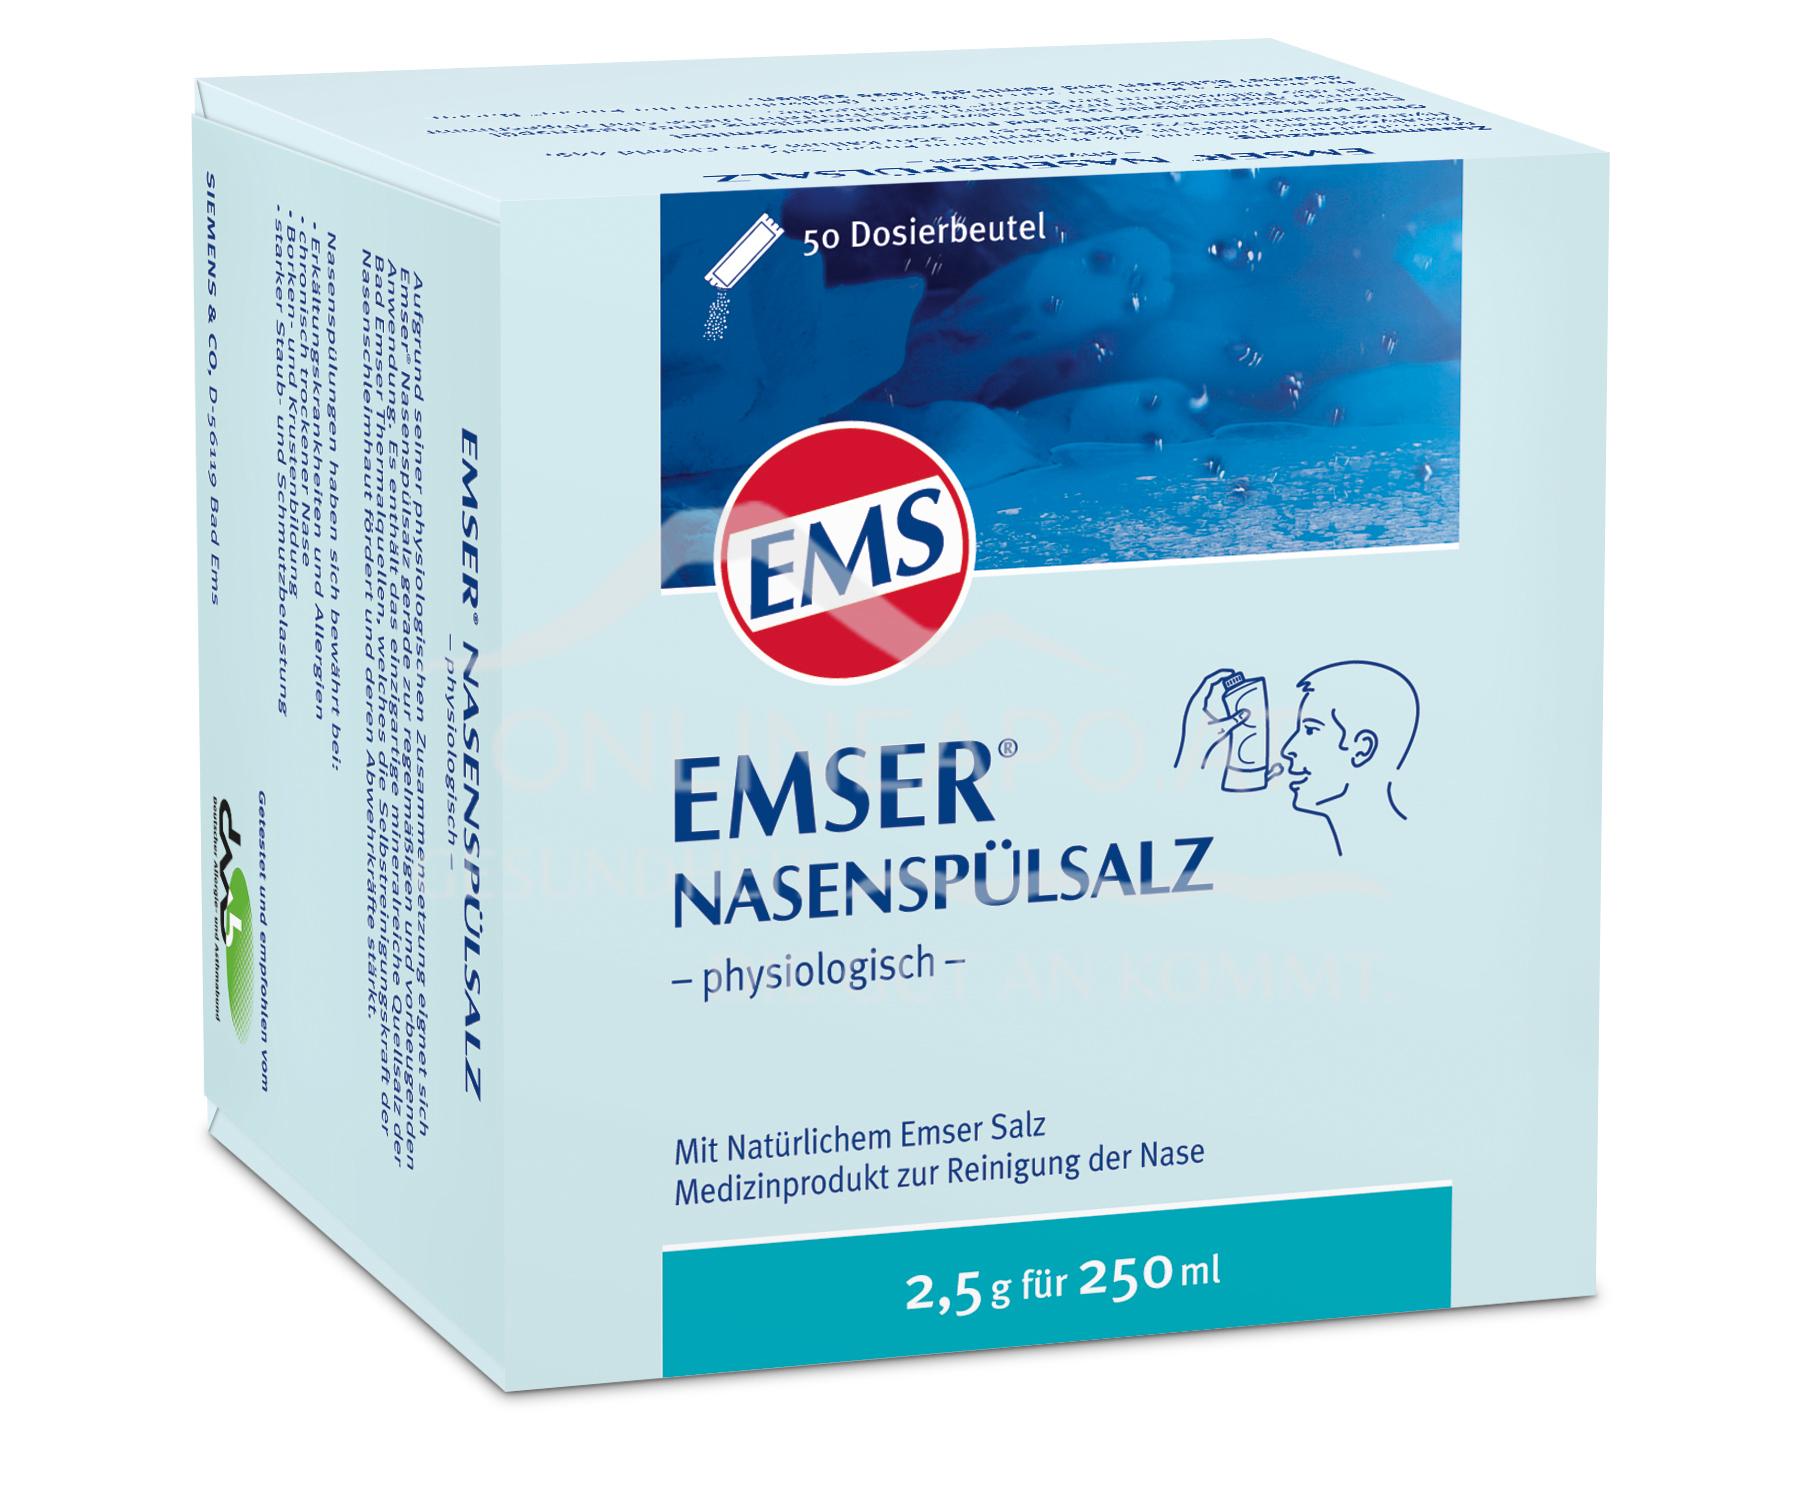 Emser® Nasenspülsalz 2,5g